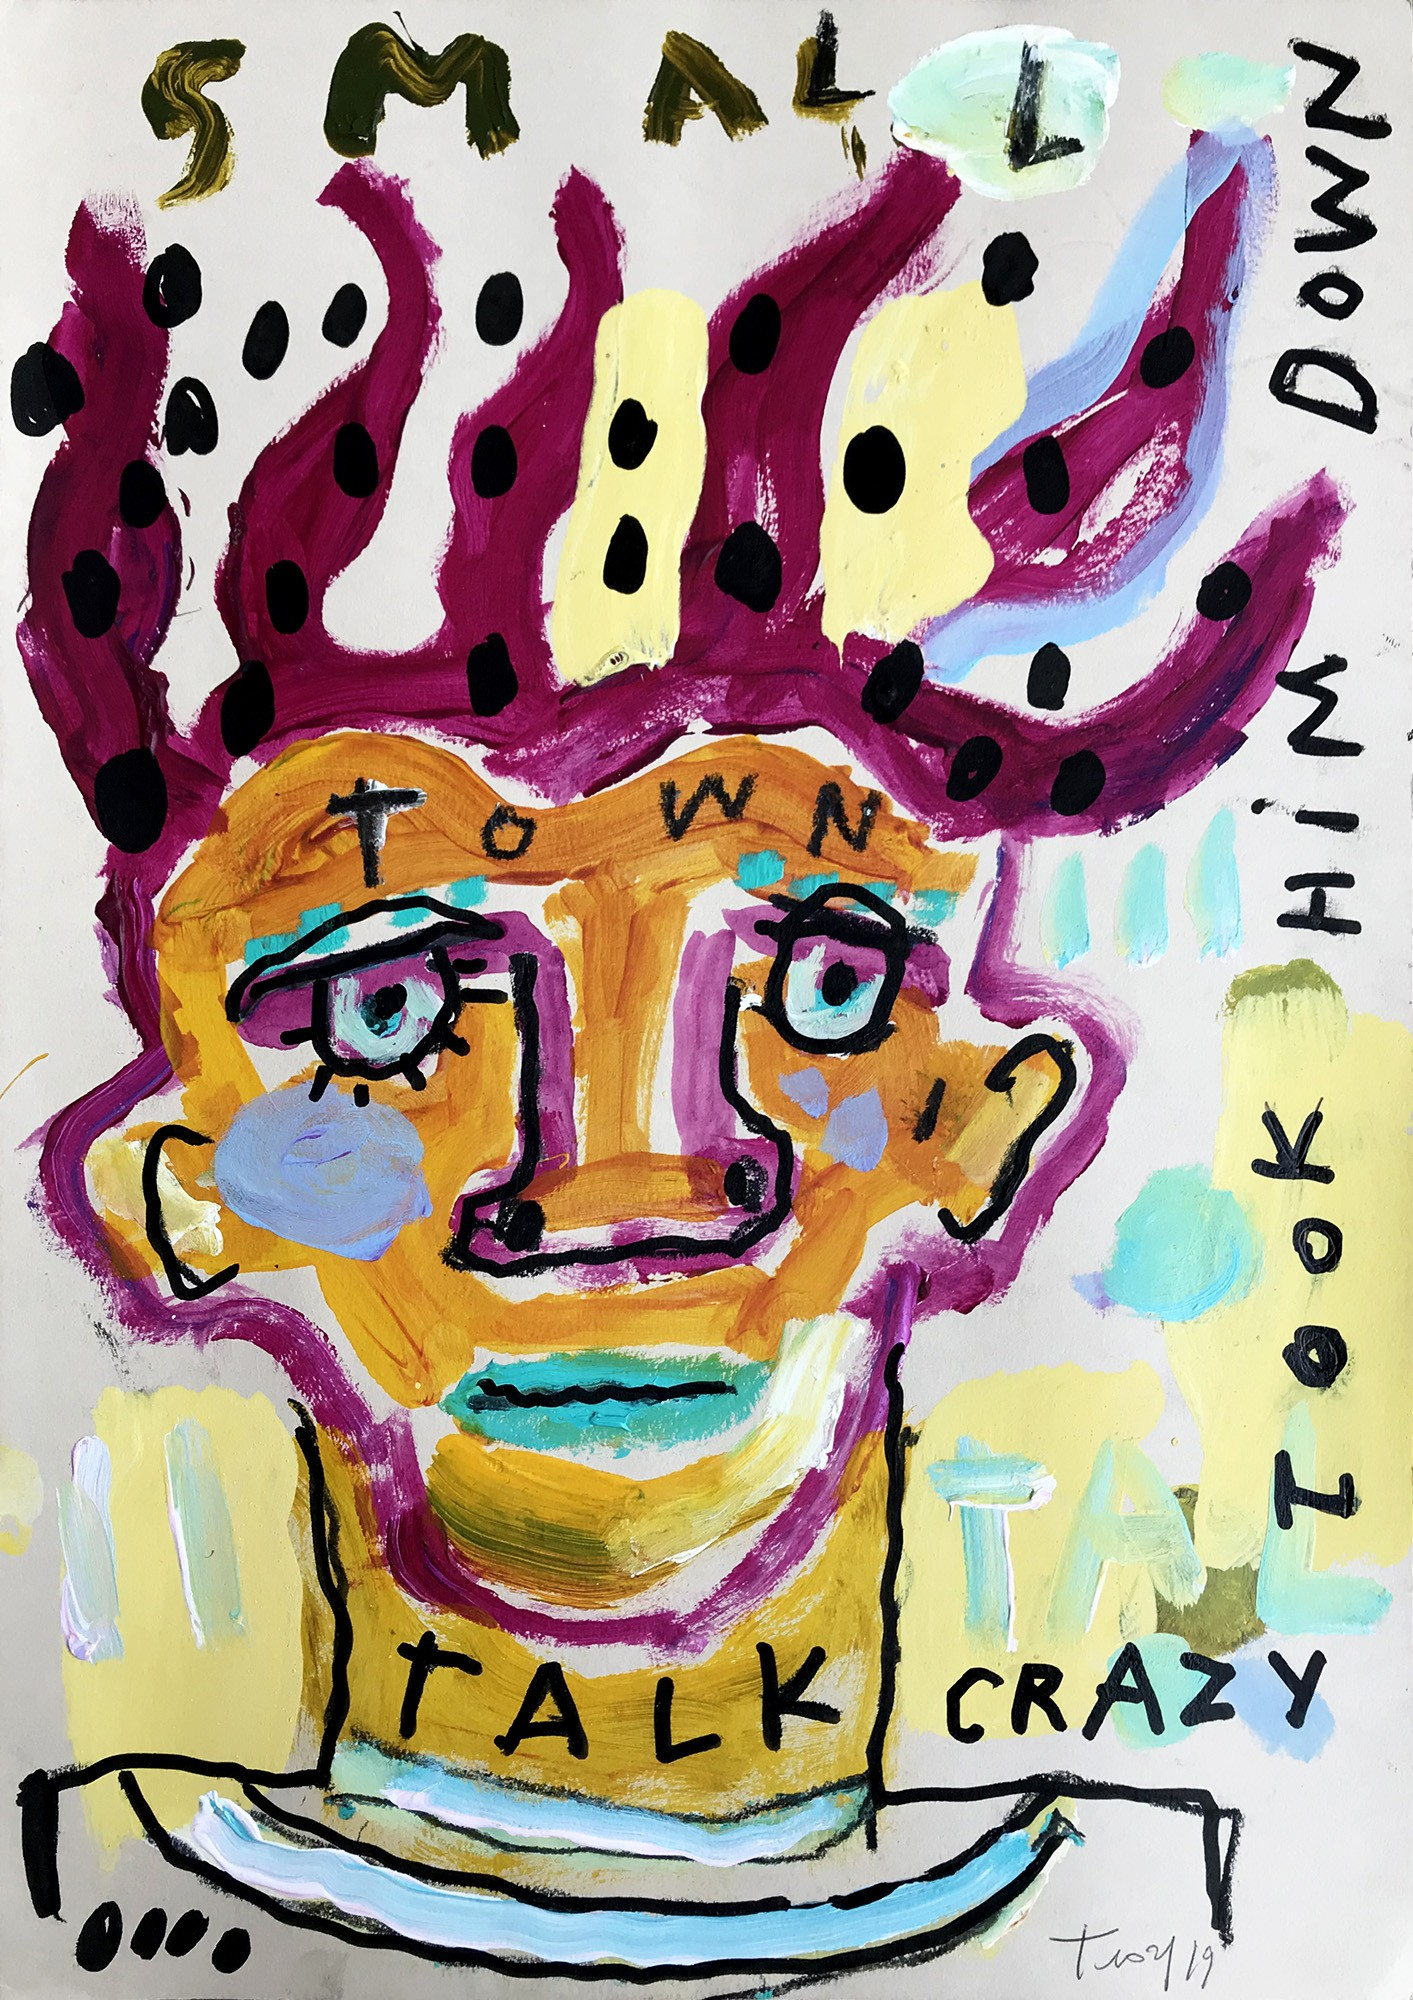 Troy Henriksen - Talk crazy